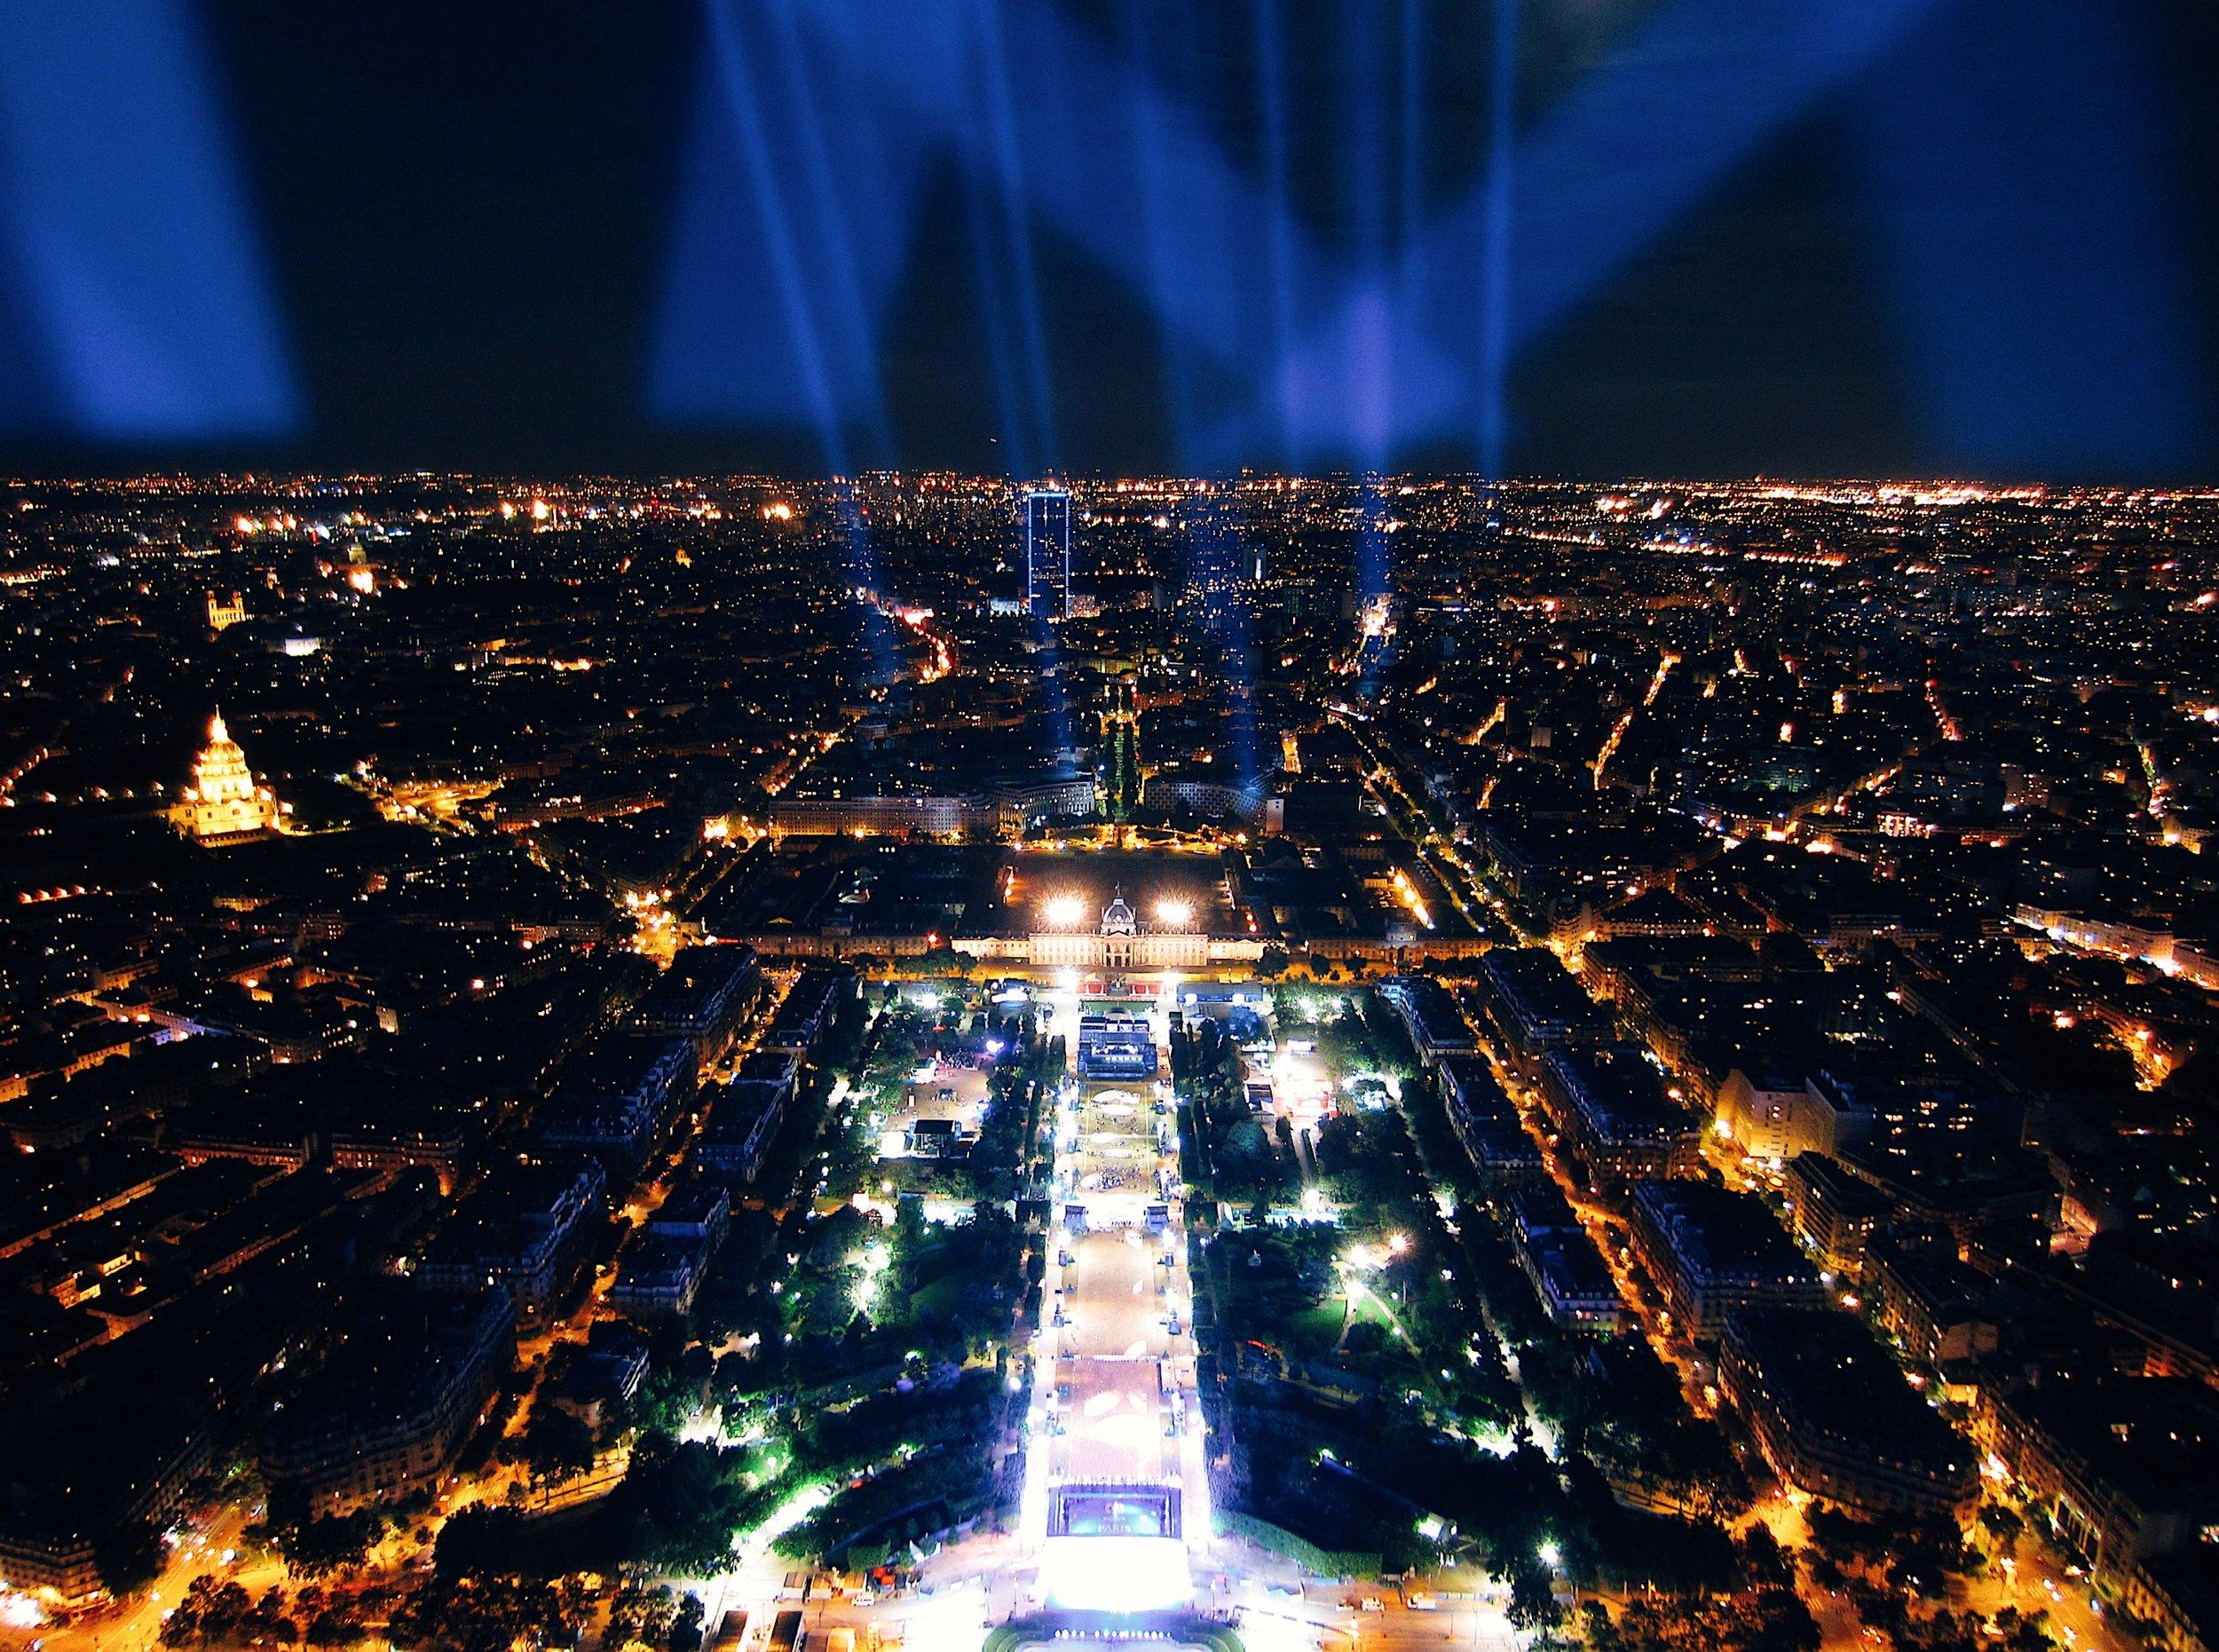 The Paris Bucket List - top of the Eiffel Tower